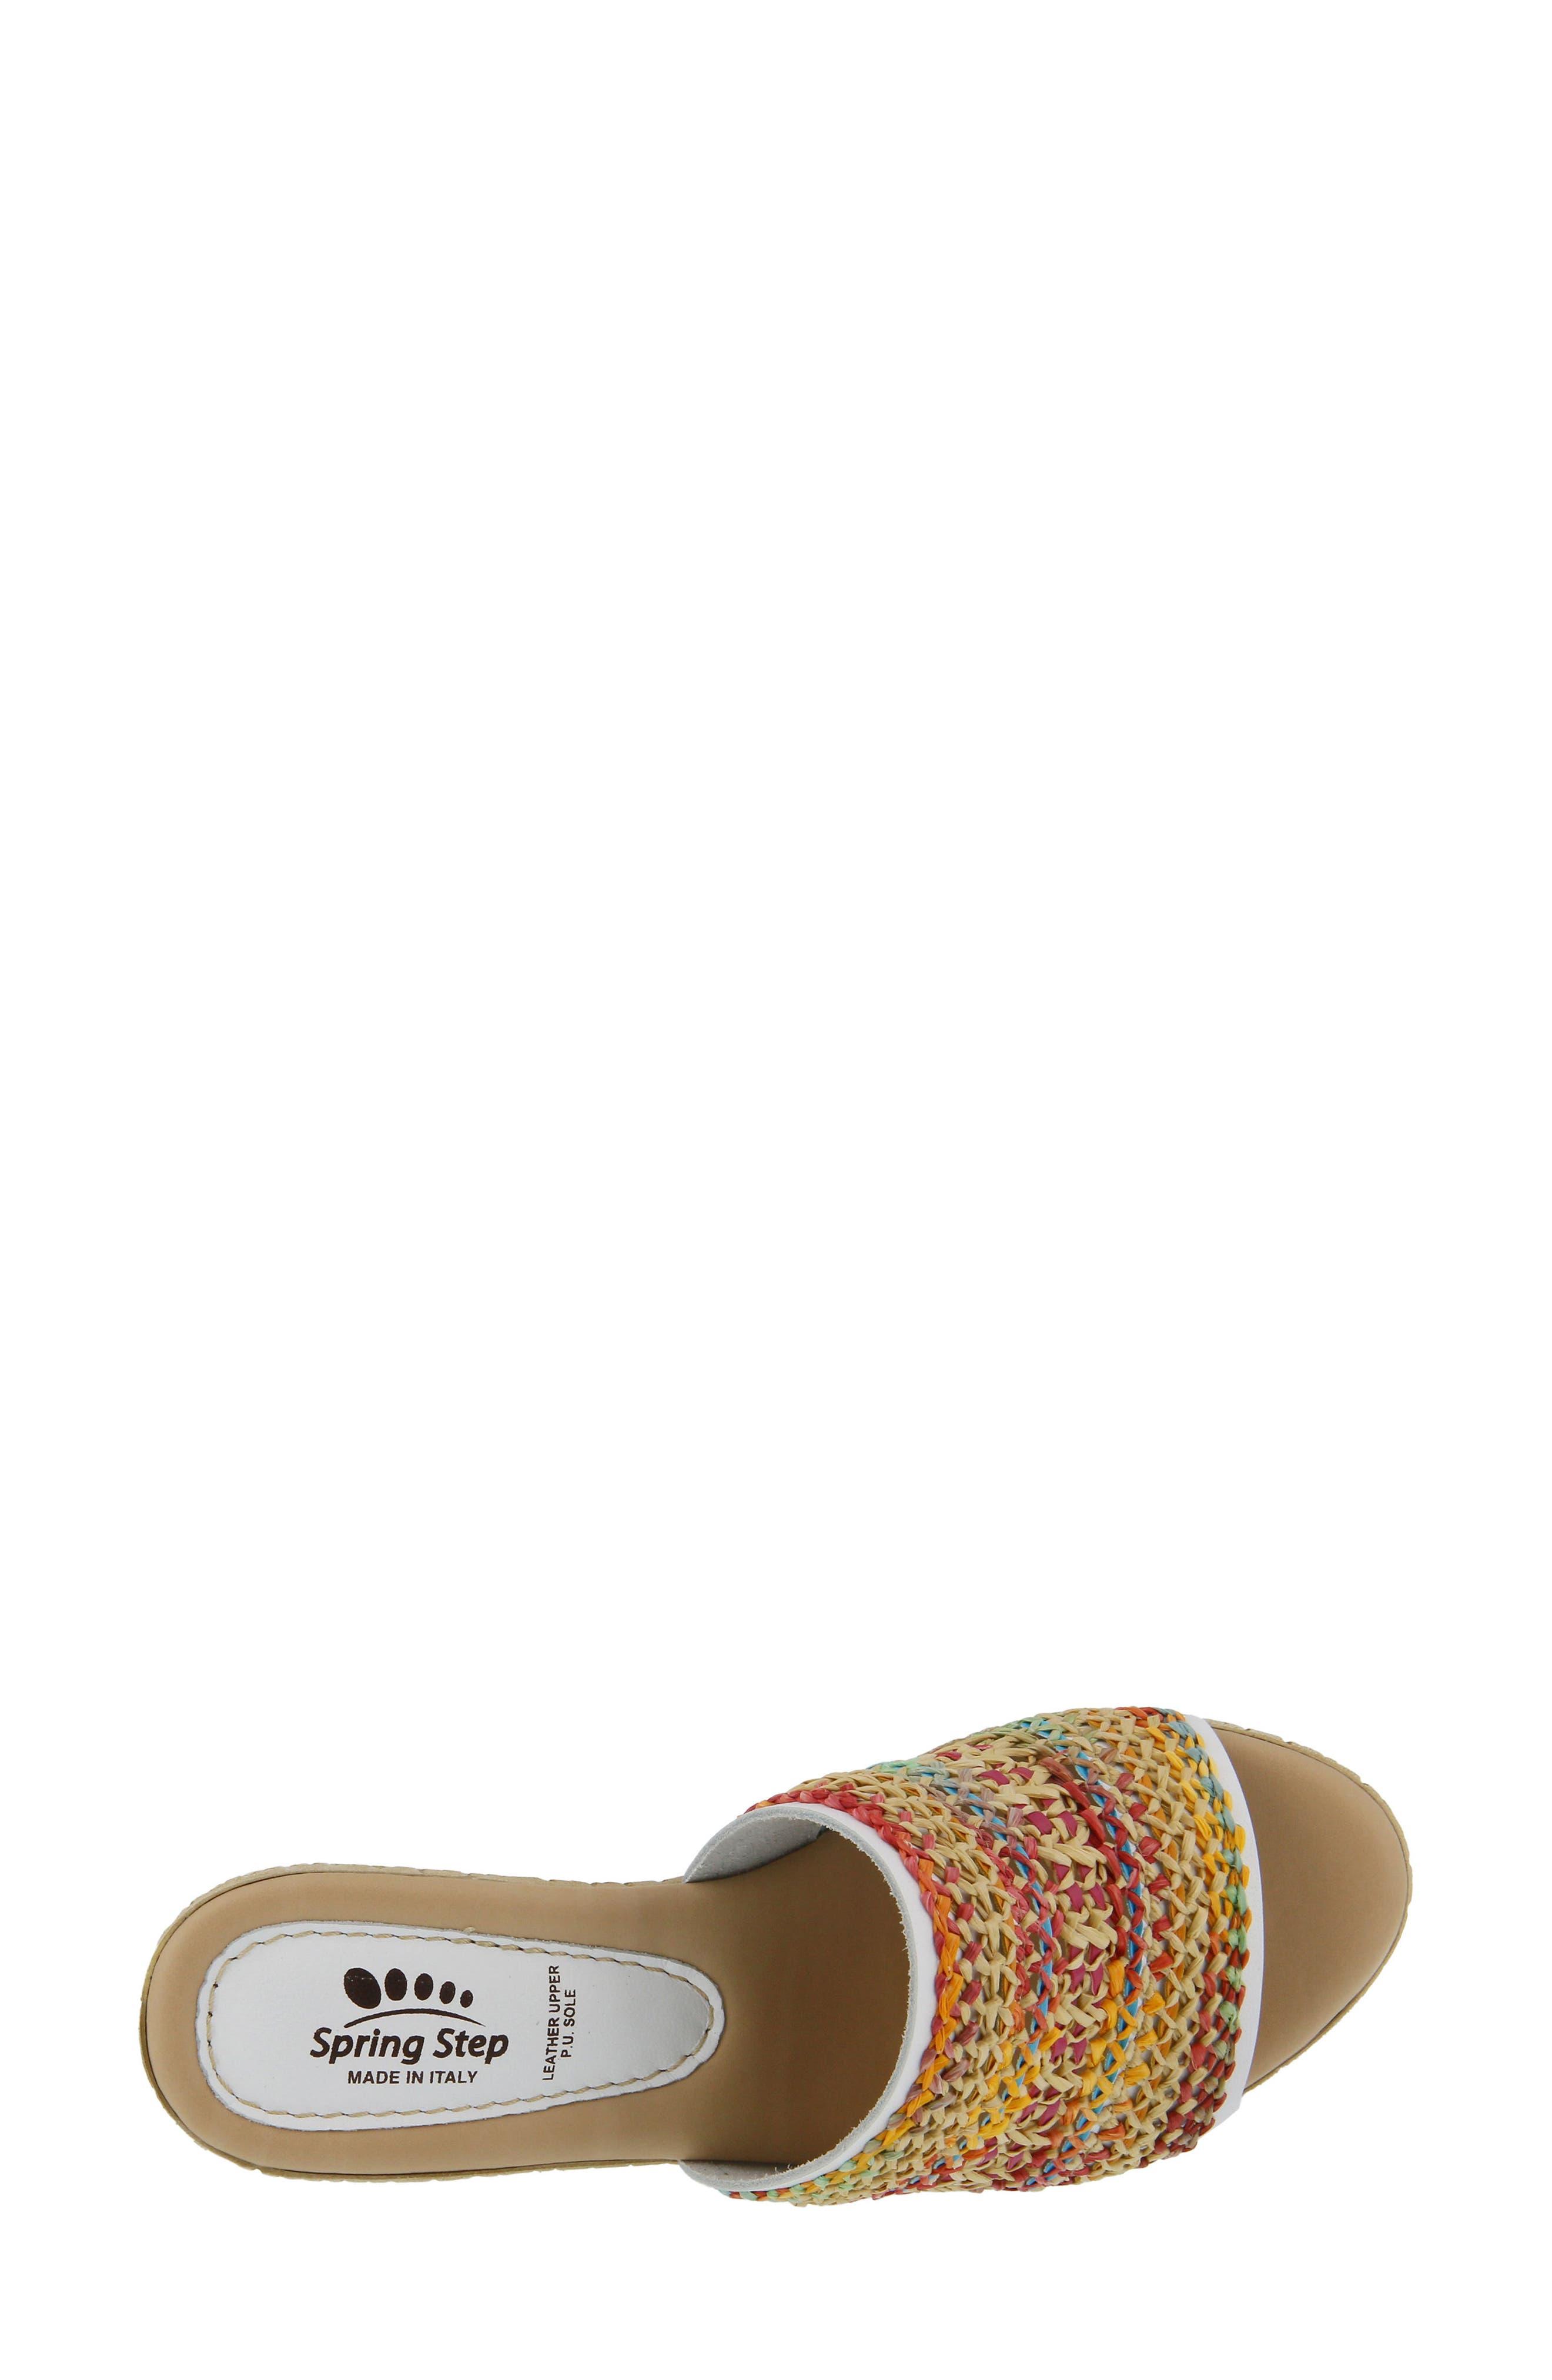 Calci Espadrille Wedge Sandal,                             Alternate thumbnail 10, color,